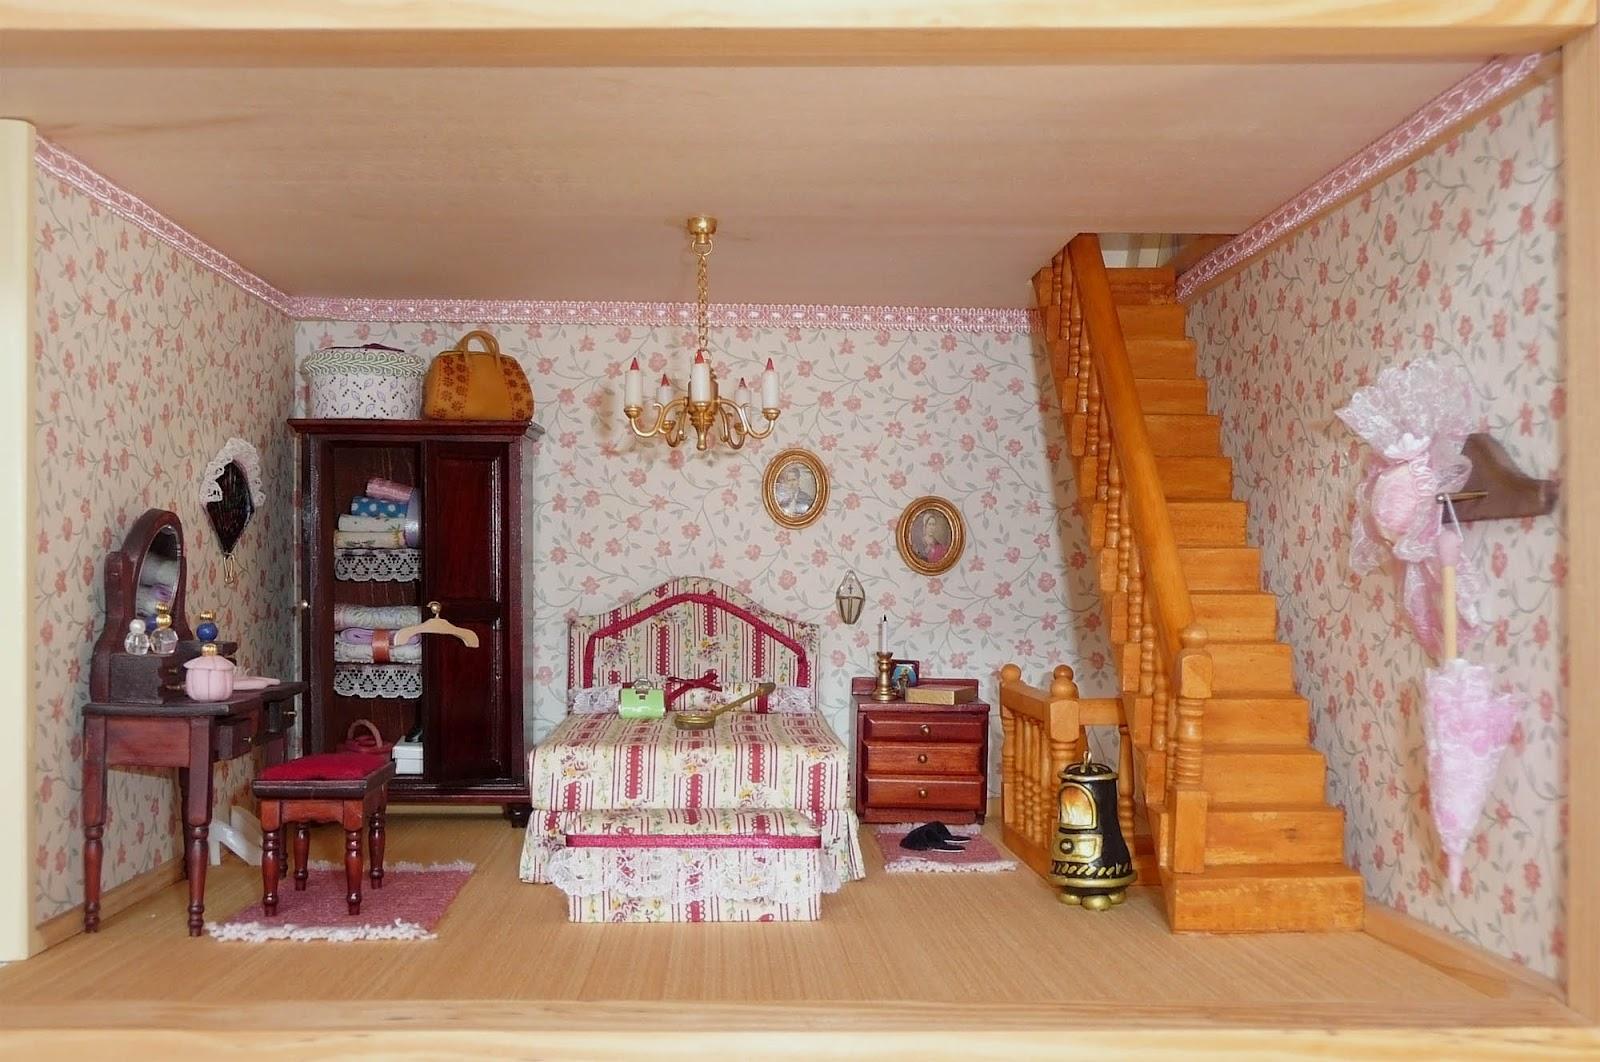 morandi sisters microworld villa amelia dollhouse bedroom bedroom set 3 white dollhouse bedroom sets superior